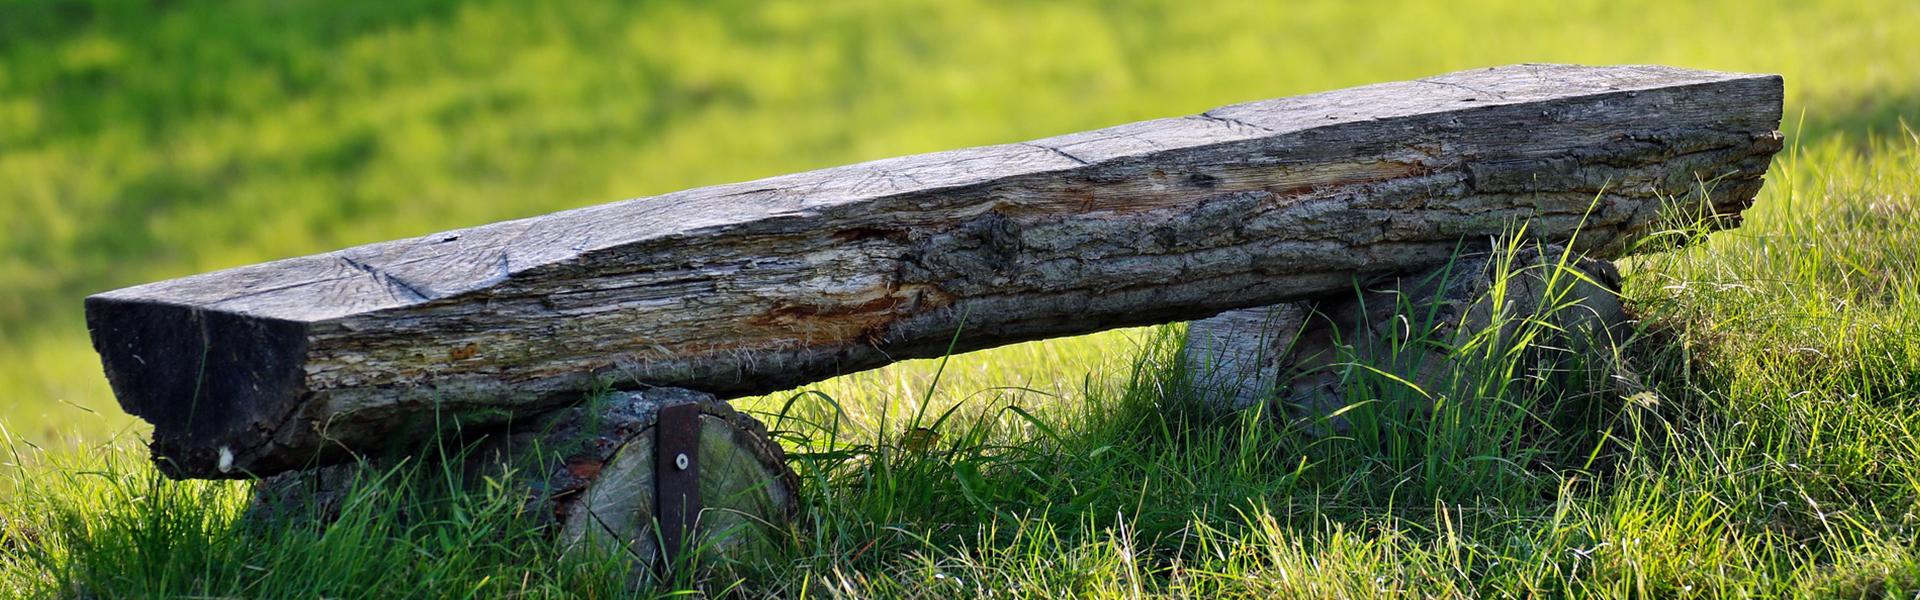 Panche Di Legno Fai Da Te.Come Costruire Una Panchina In Legno Fai Da Te Efco